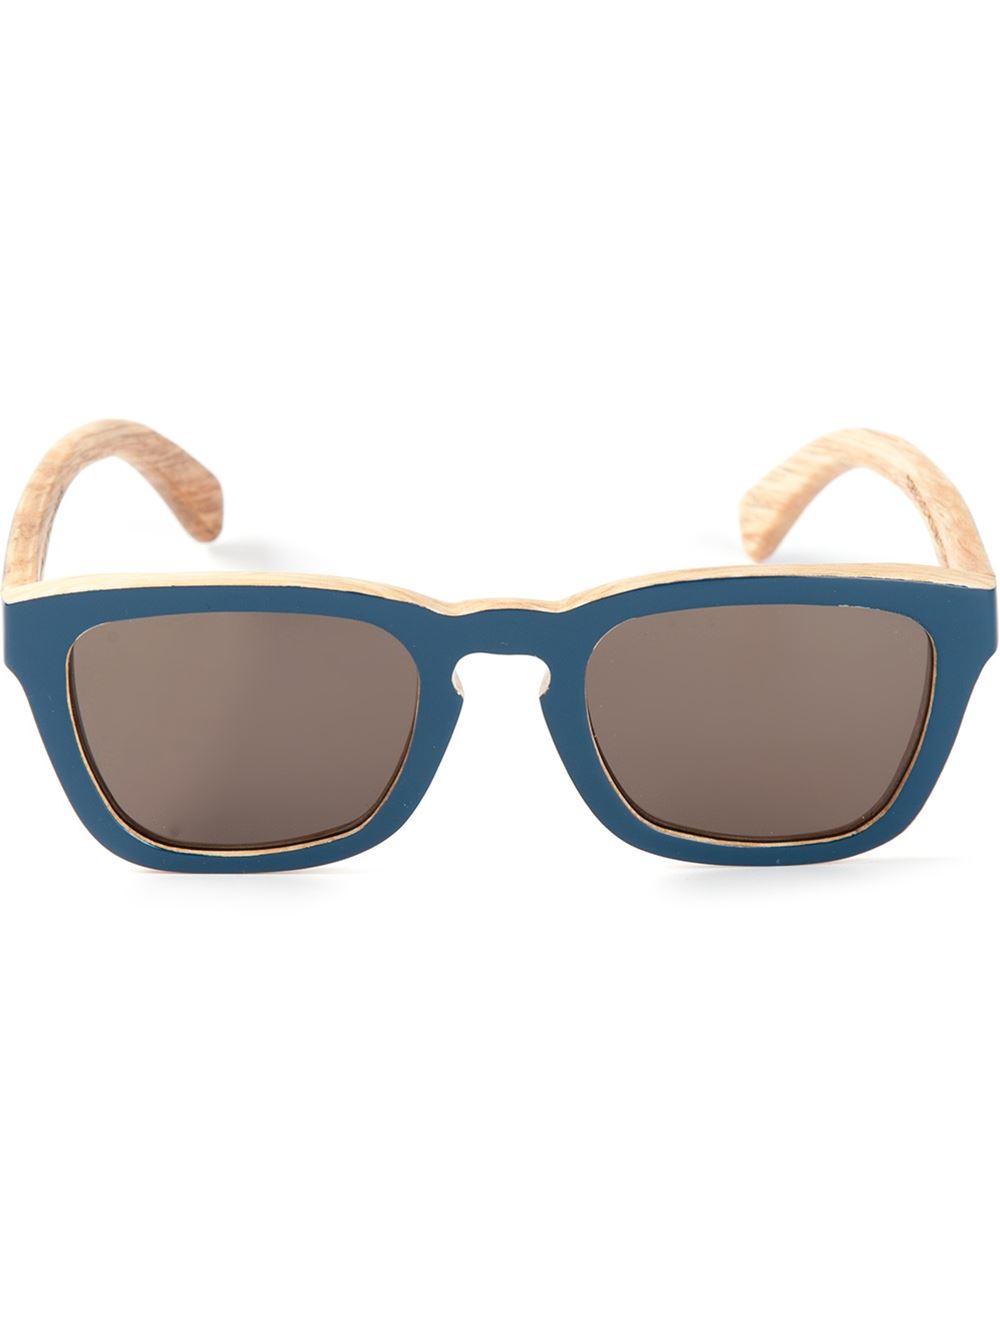 bc5a25148c Wayfarer Blue Blocking Sunglasses « Heritage Malta